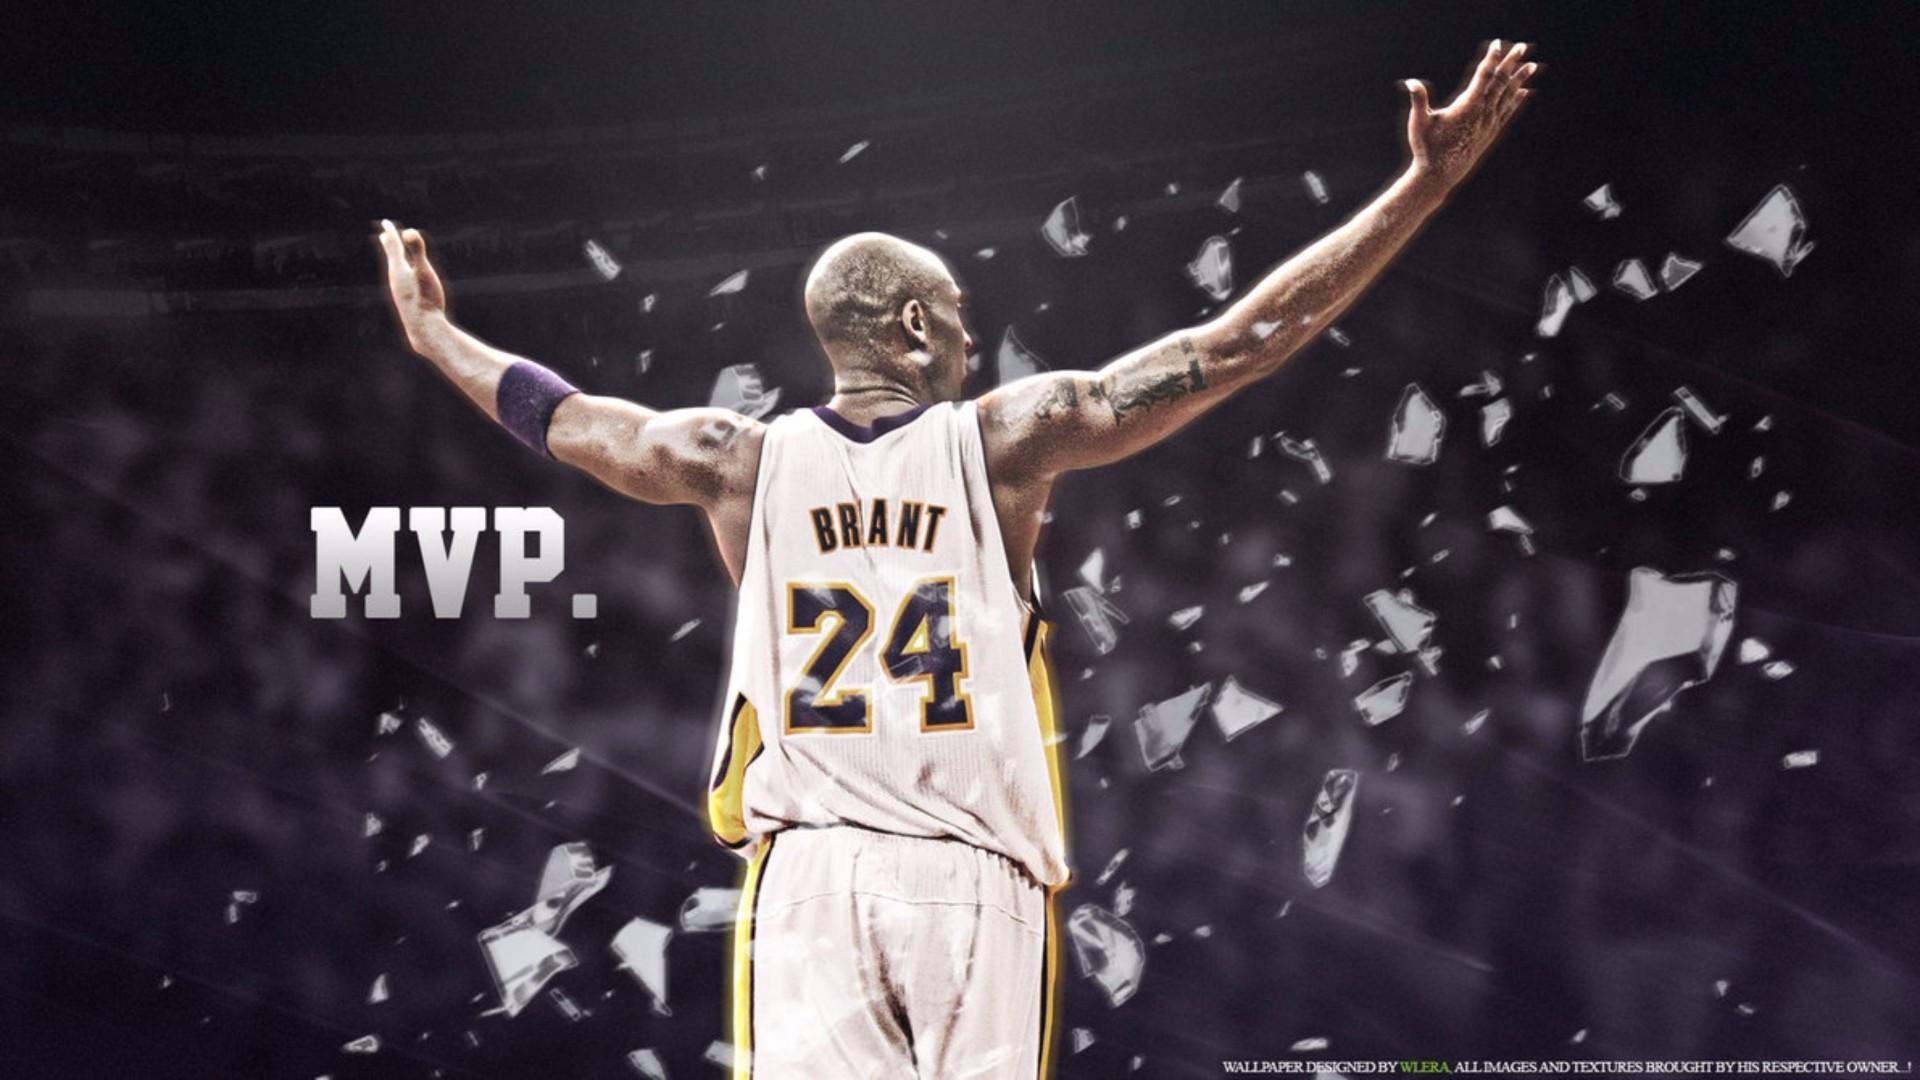 Kobe Bryant 24 Wallpaper (75+ pictures)